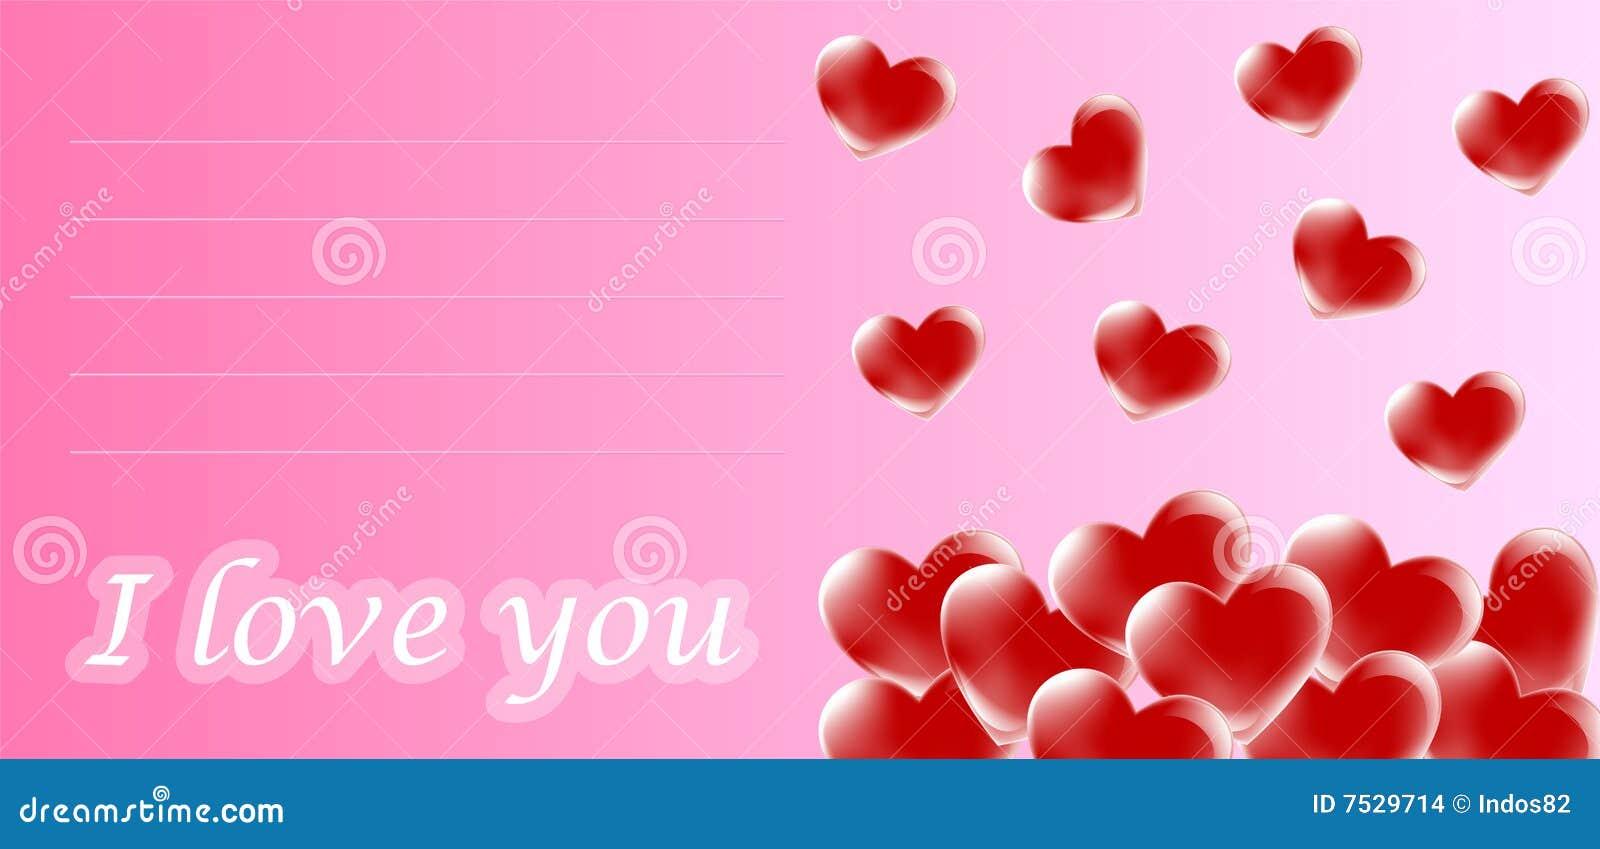 Valentine Card Images Image 7529714 – Valentine Card Images